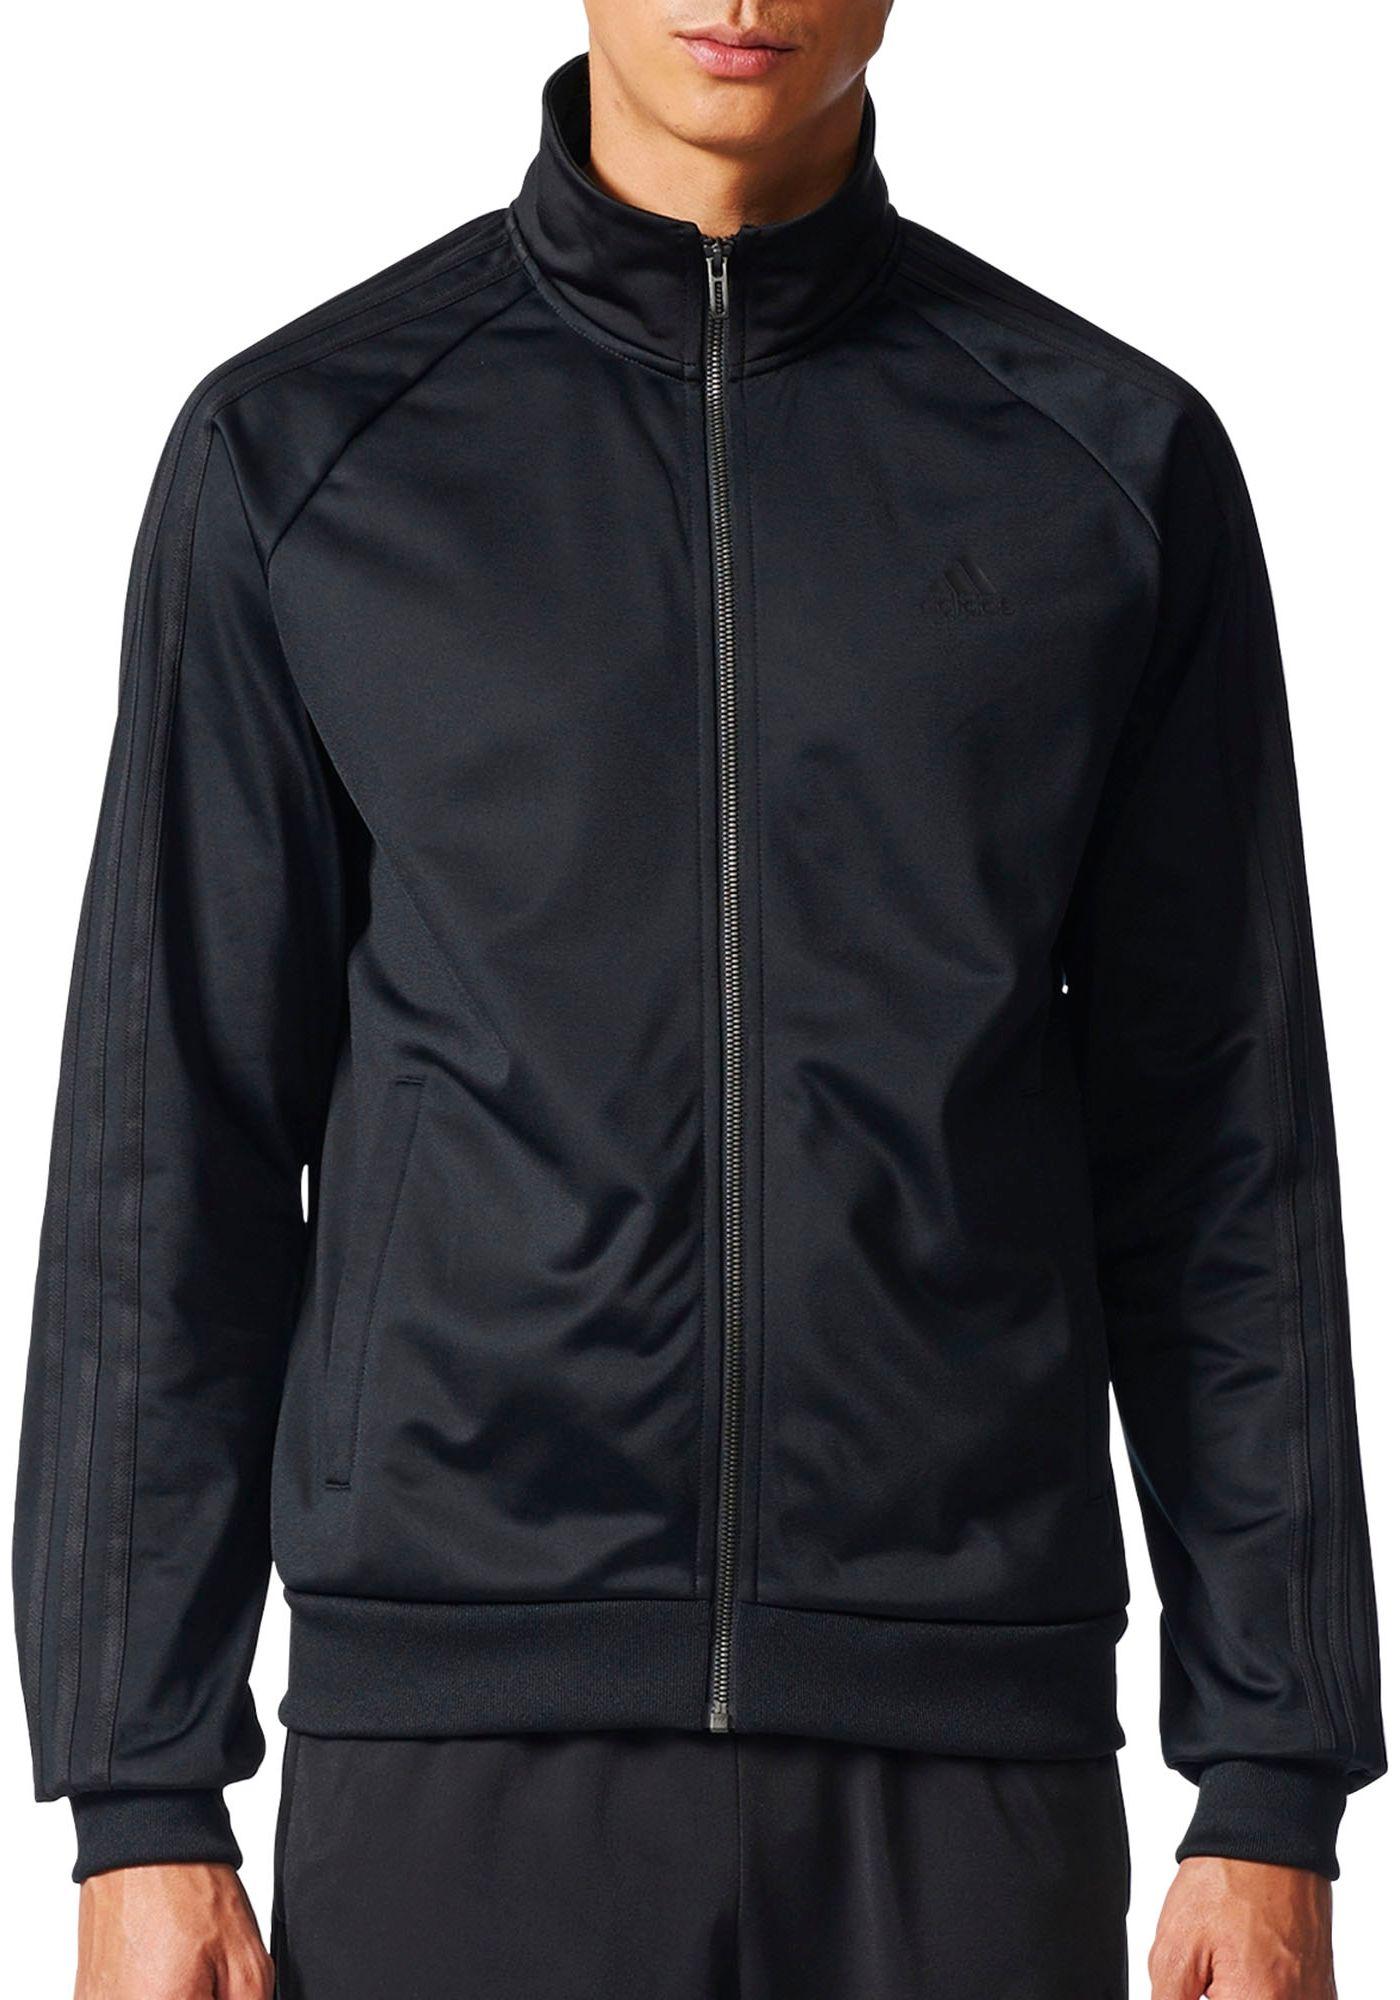 adidas Men's Essentials 3-Stripes Track Jacket